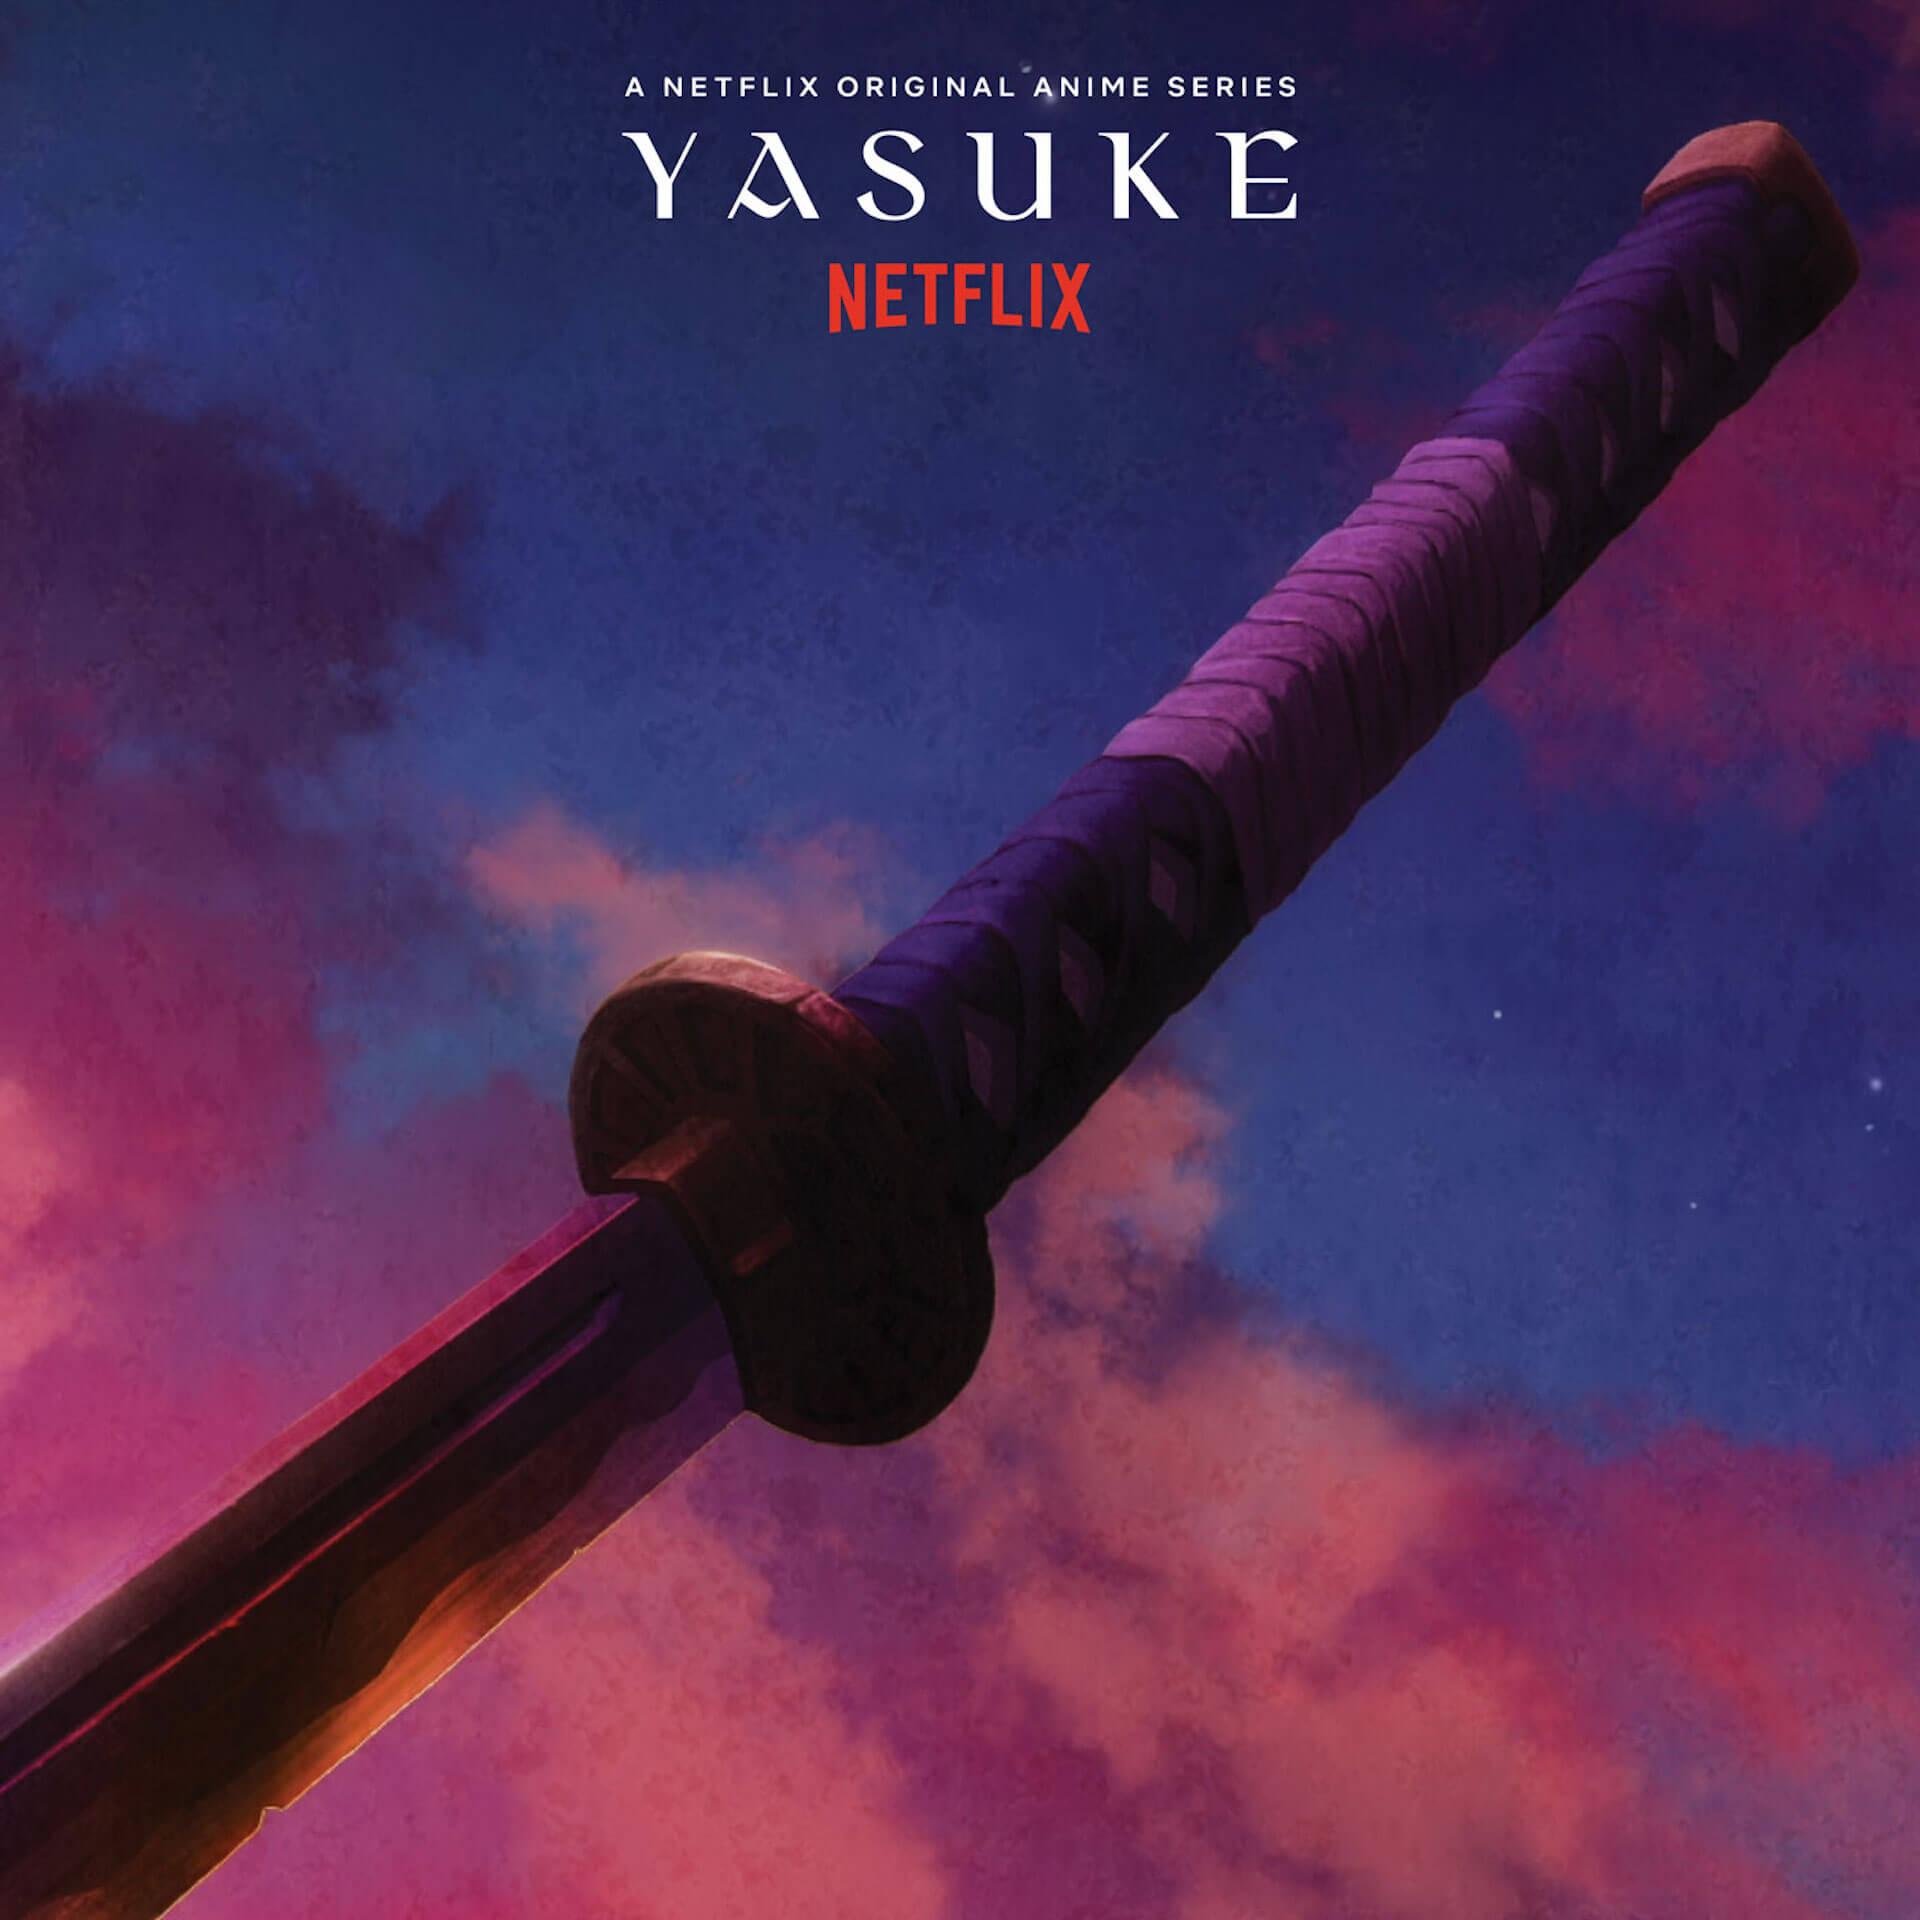 『YASUKE -ヤスケ-』の音楽を手がけたFlying Lotus最新作『YASUKE』が明日CDリリース!超高音質試聴イベントも実施 music210617_flyinglotus_yasuke_6